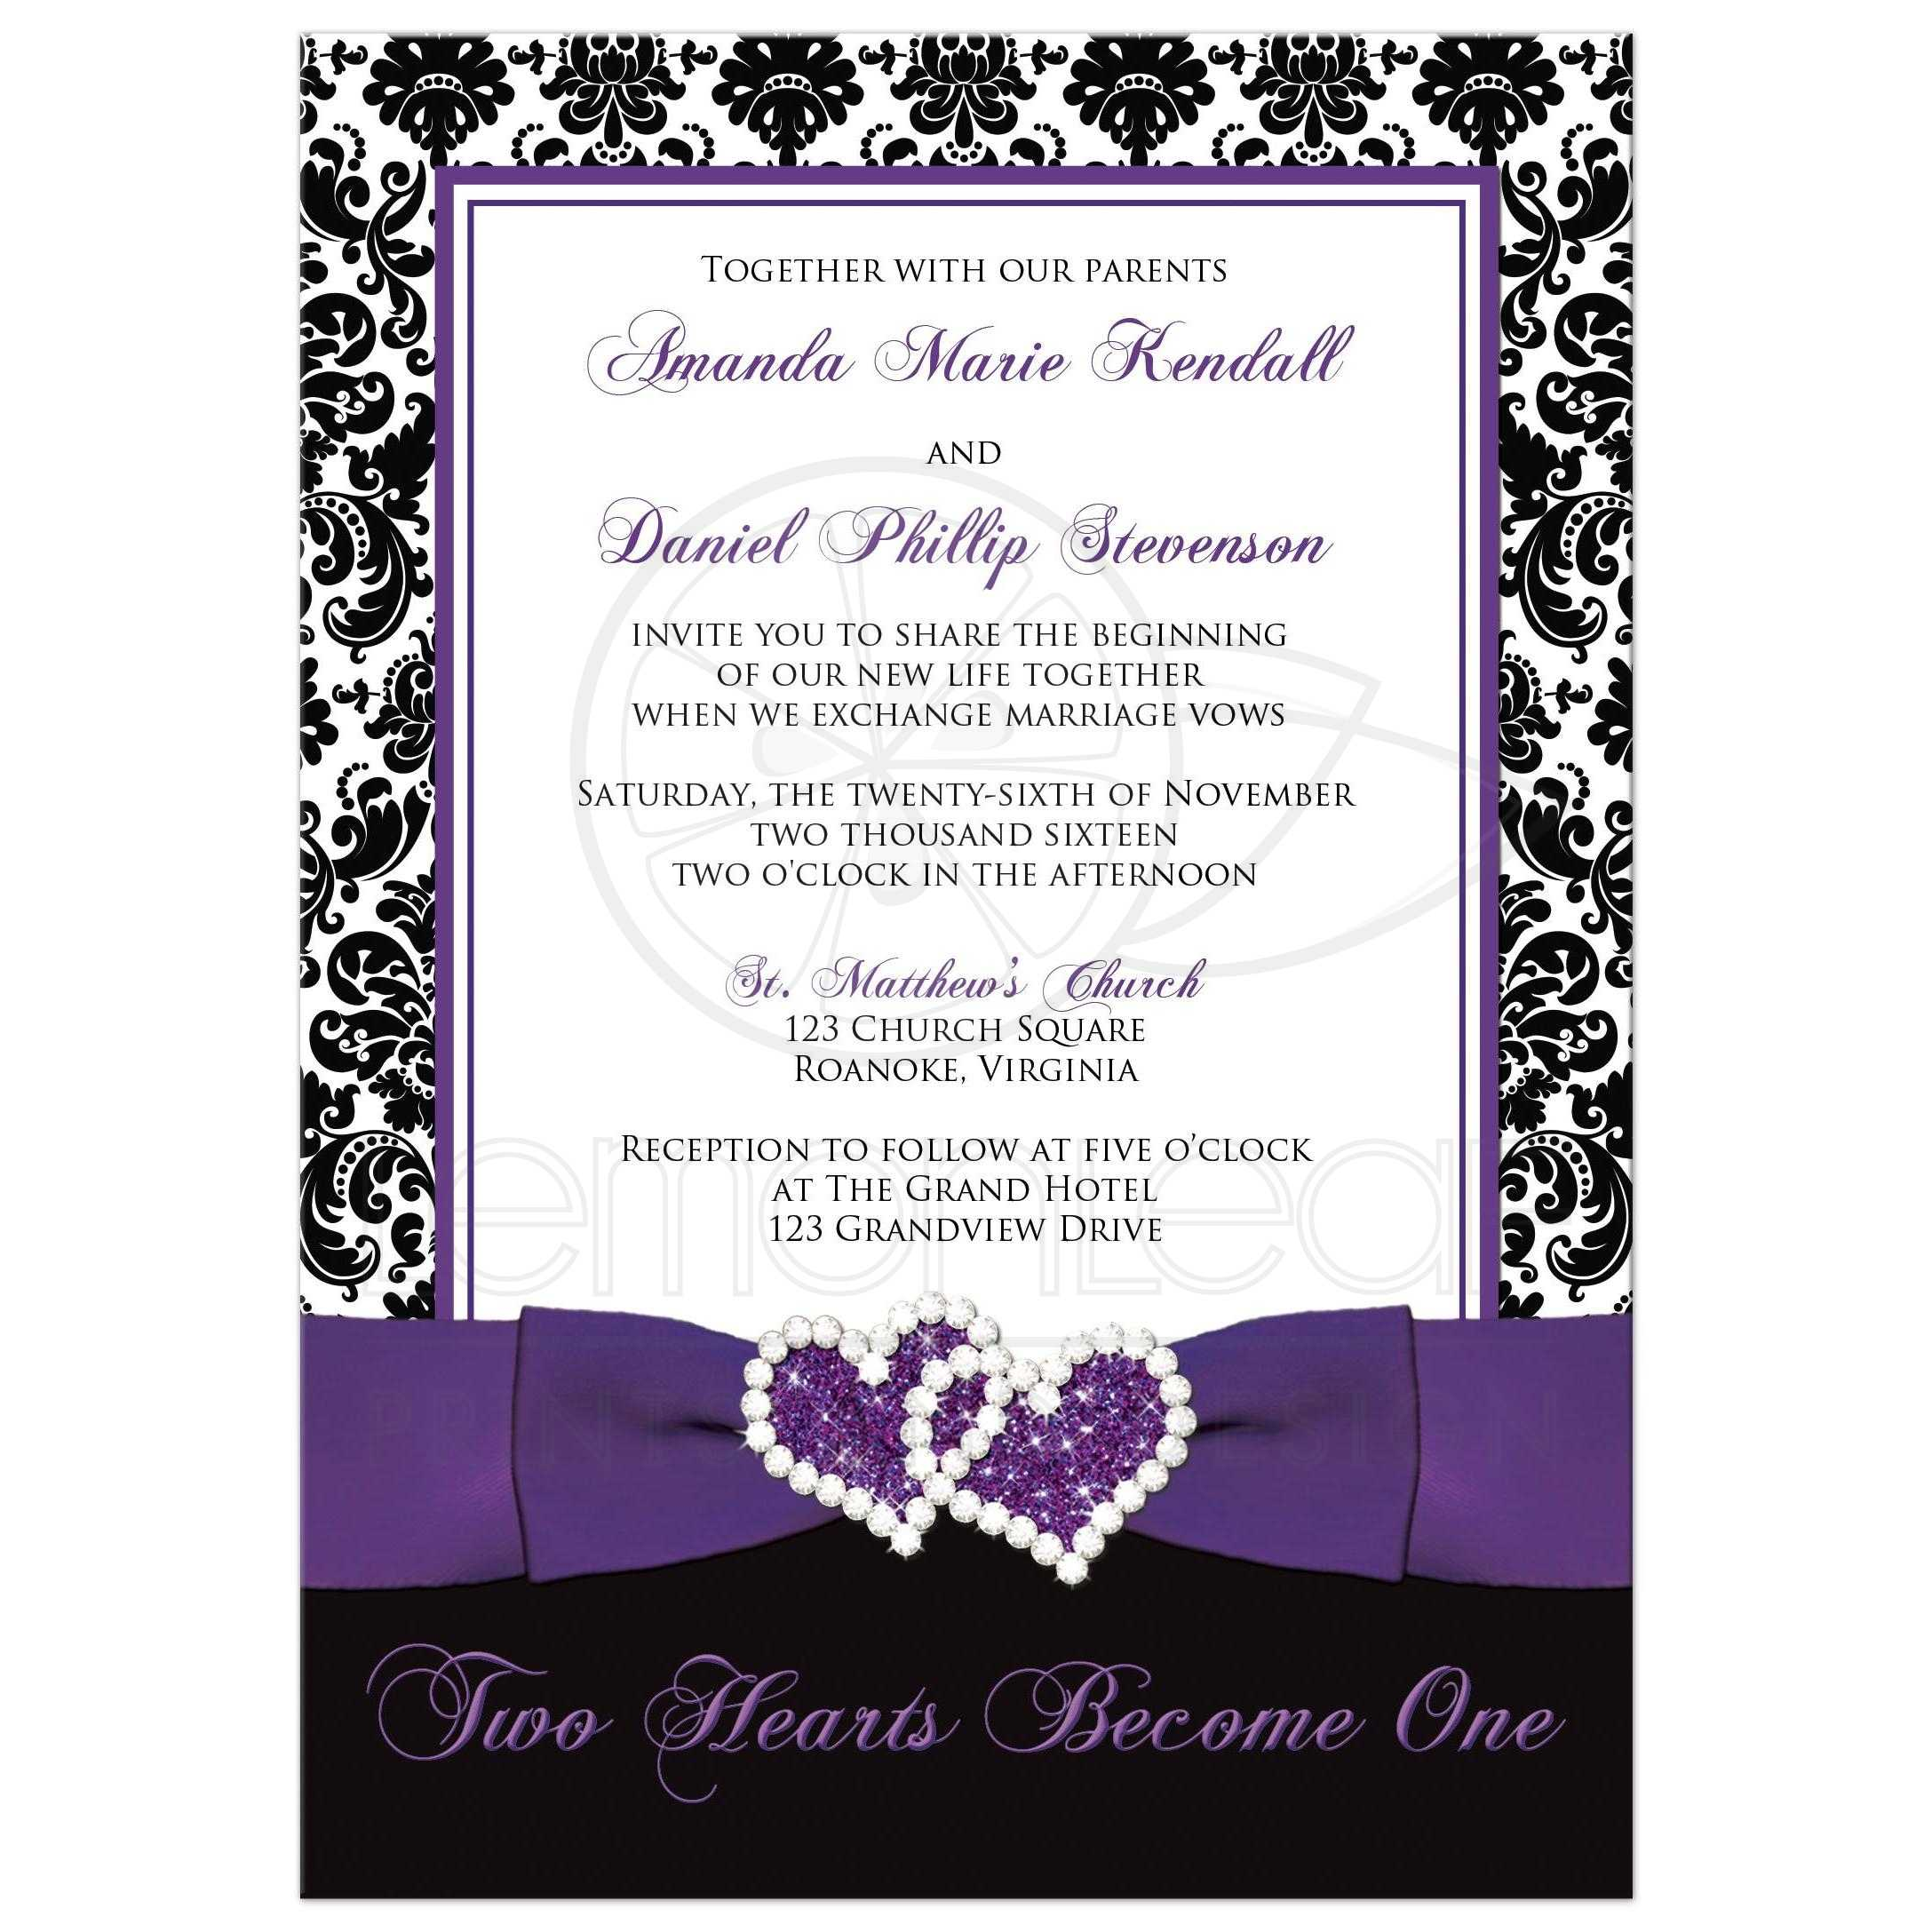 Wedding Invitation - Optional PHOTO Template | Black and White ...